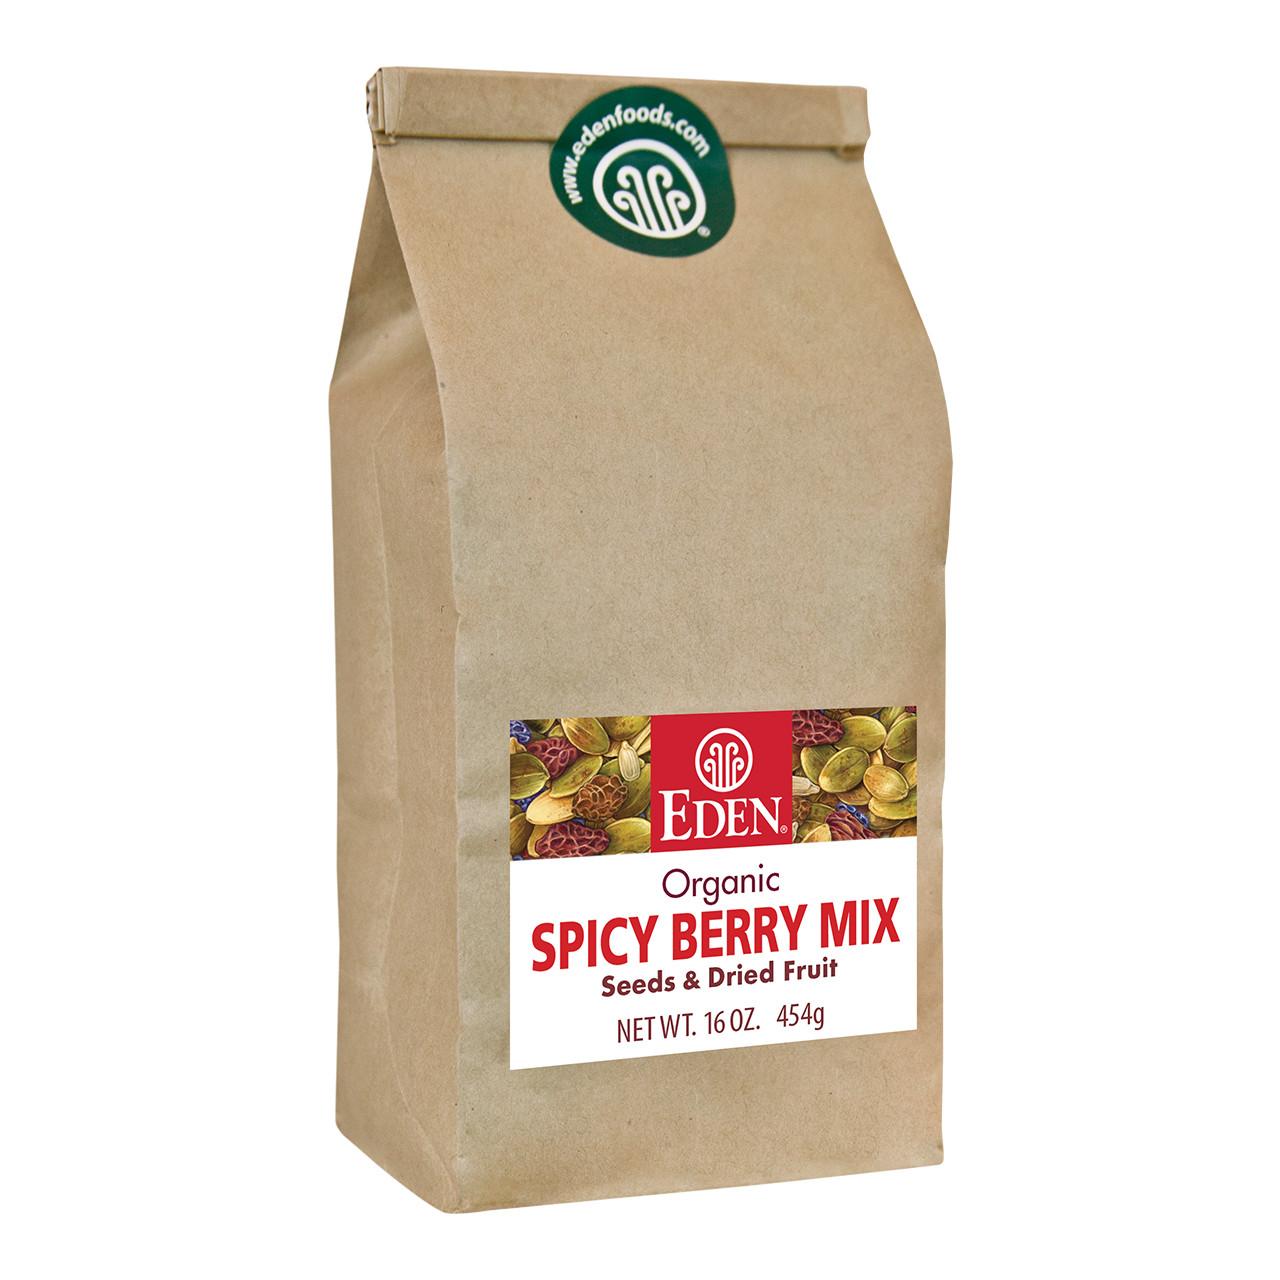 Spicy Berry Mix, Organic - 1 lb